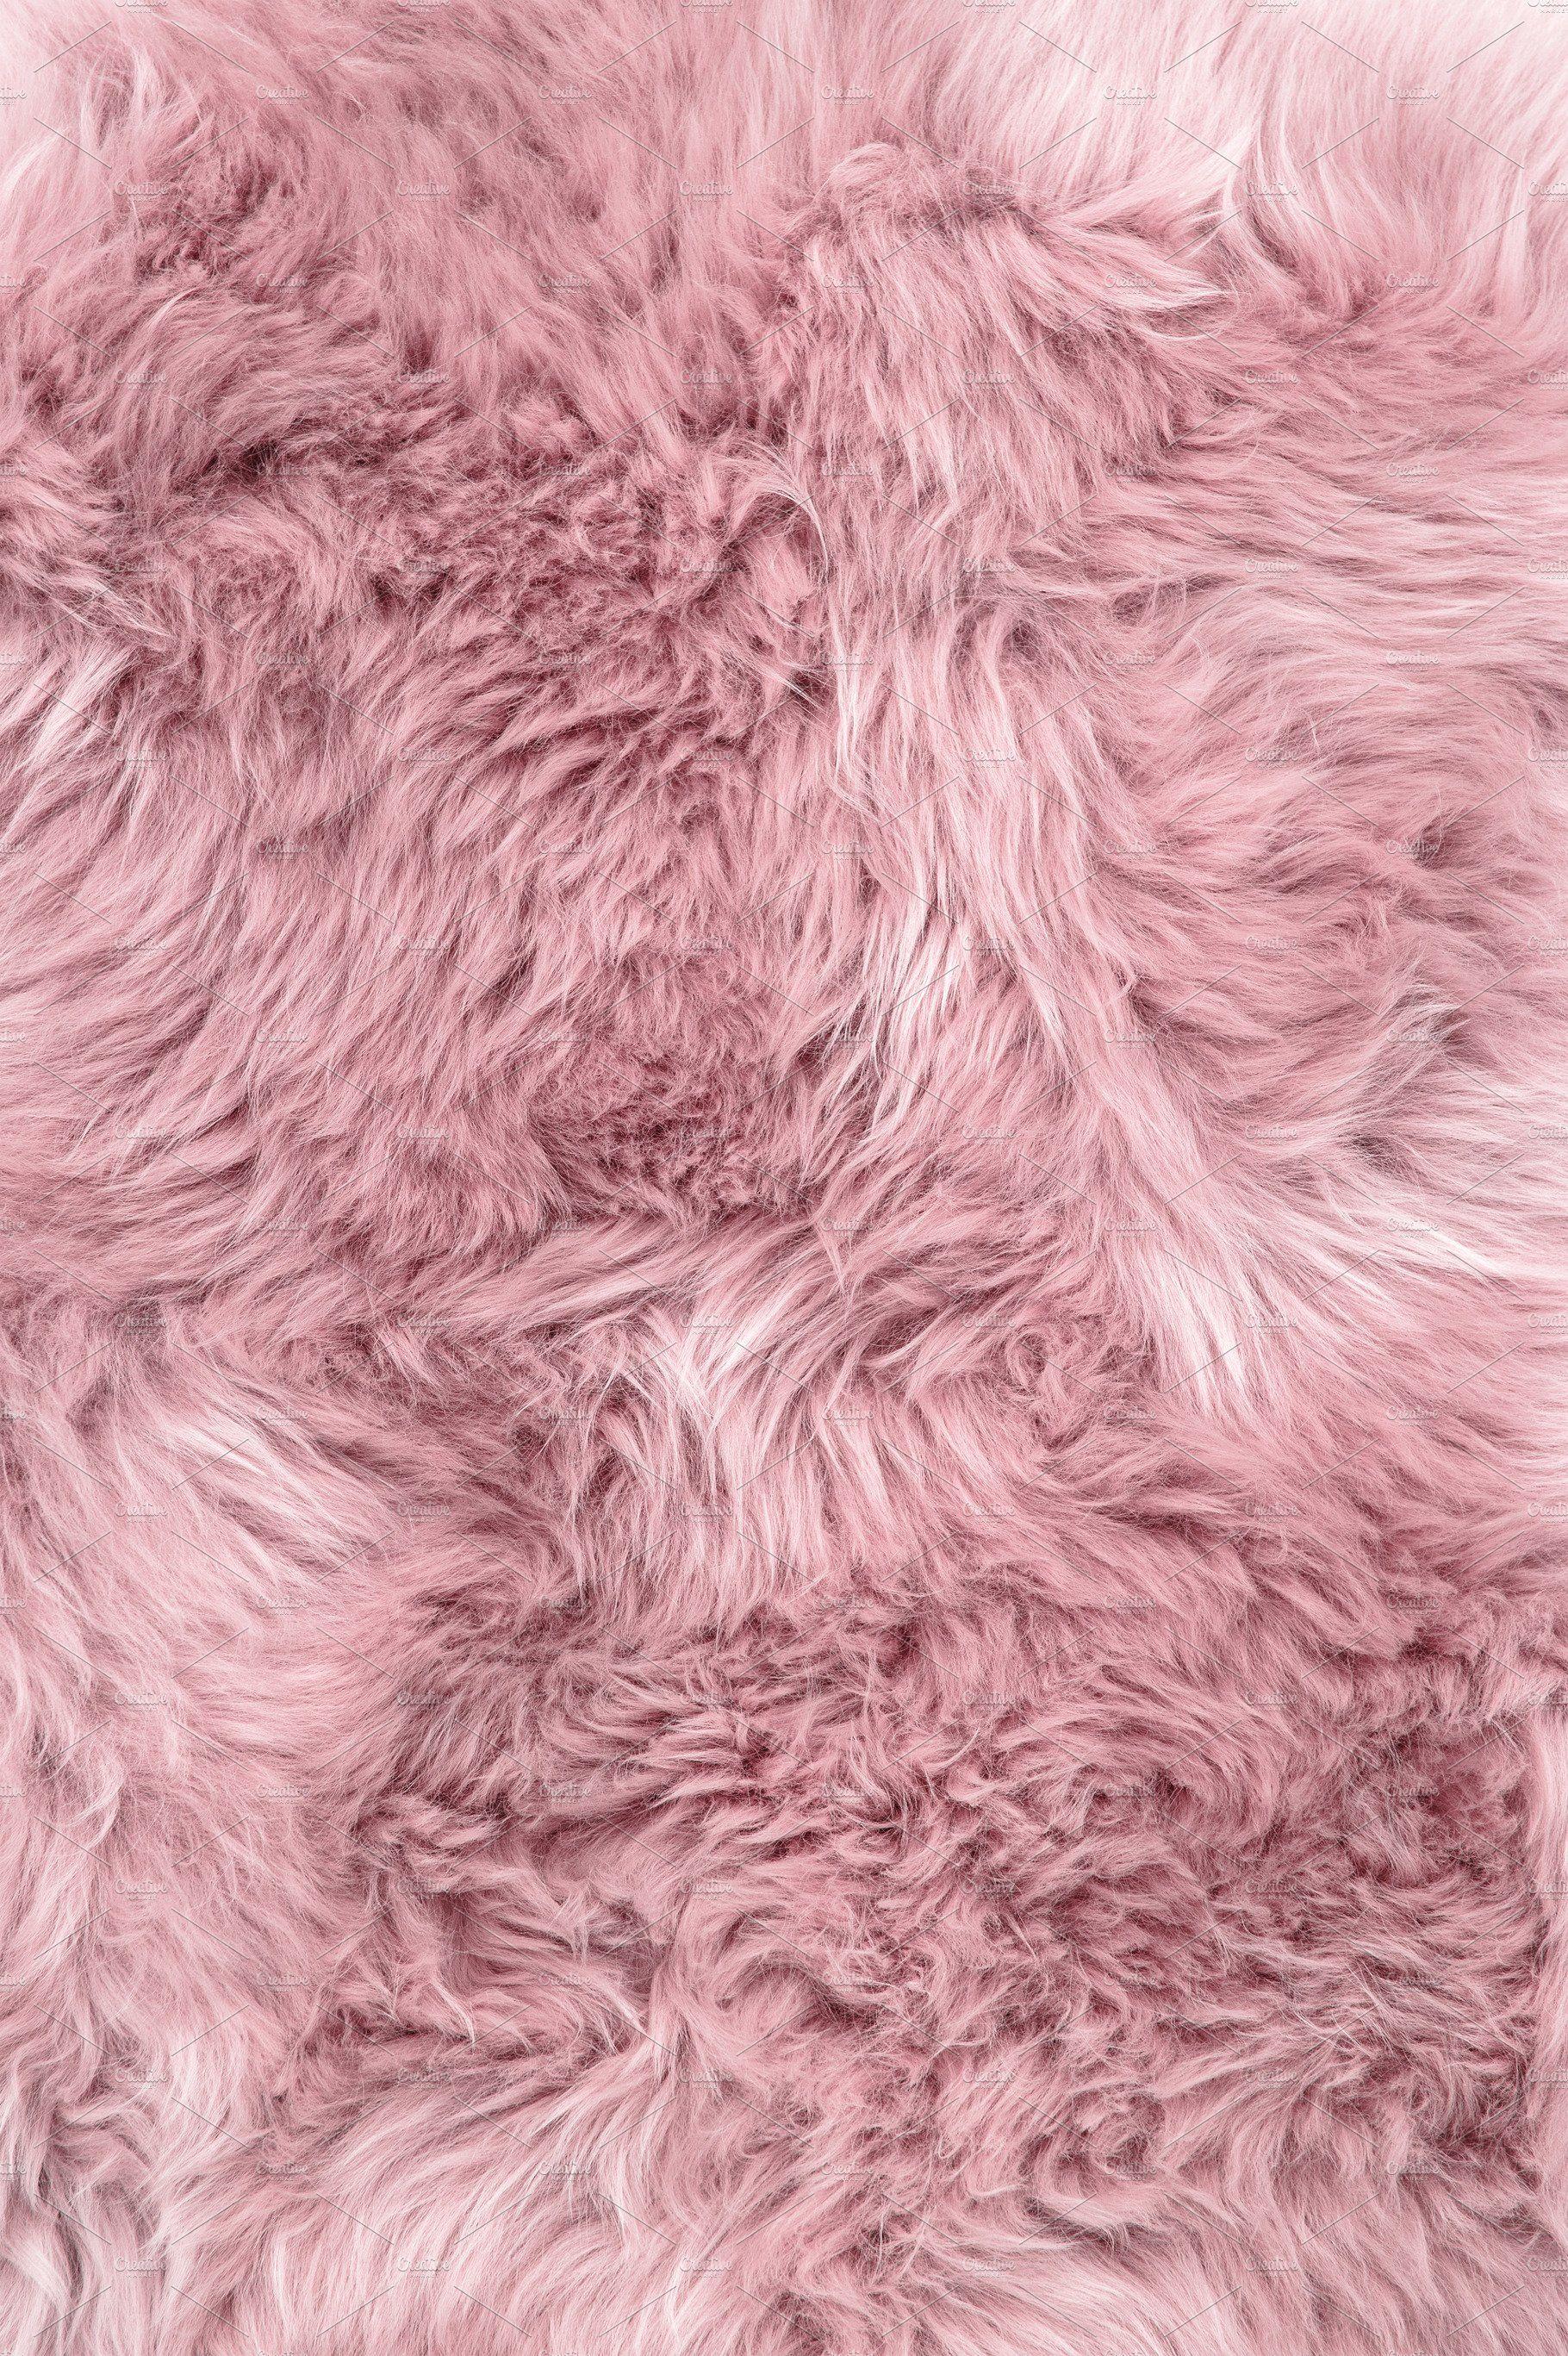 Sheep Fur Pink Sheepskin Rug Backgro Rozovye Oboi Vintazh Oboi